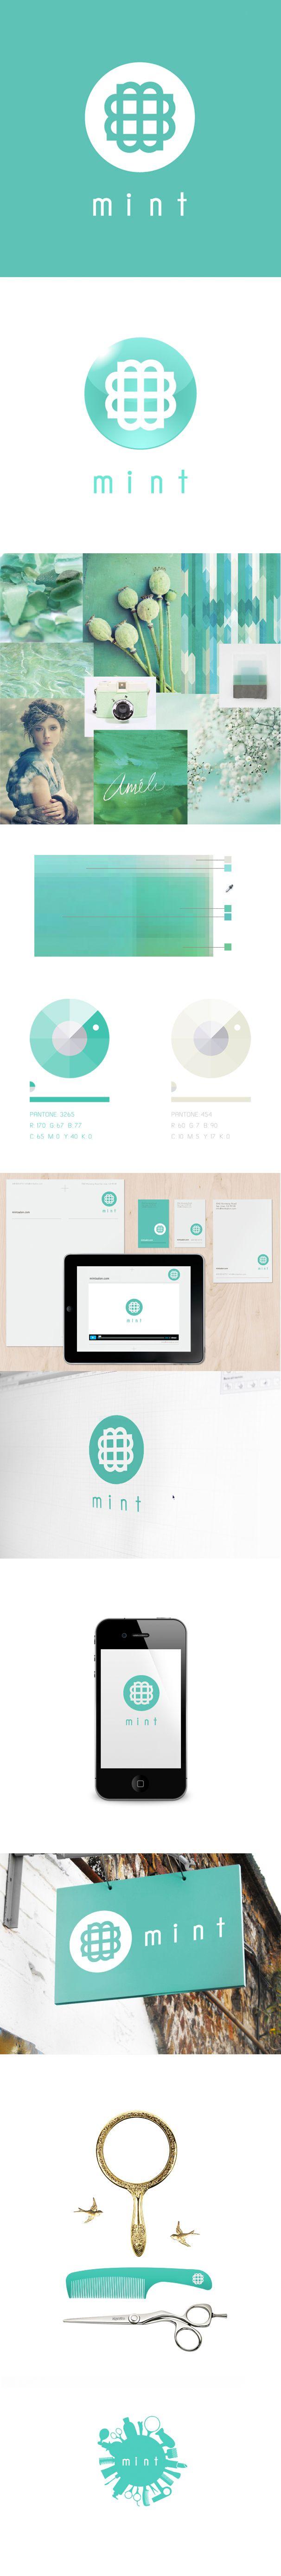 Mint Salon Design | #stationary #corporate #design #corporatedesign #logo #identity #branding #marketing <<< repinned by an #advertising agency from #Hamburg / #Germany - www.BlickeDeeler.de | Follow us on www.facebook.com/BlickeDeeler